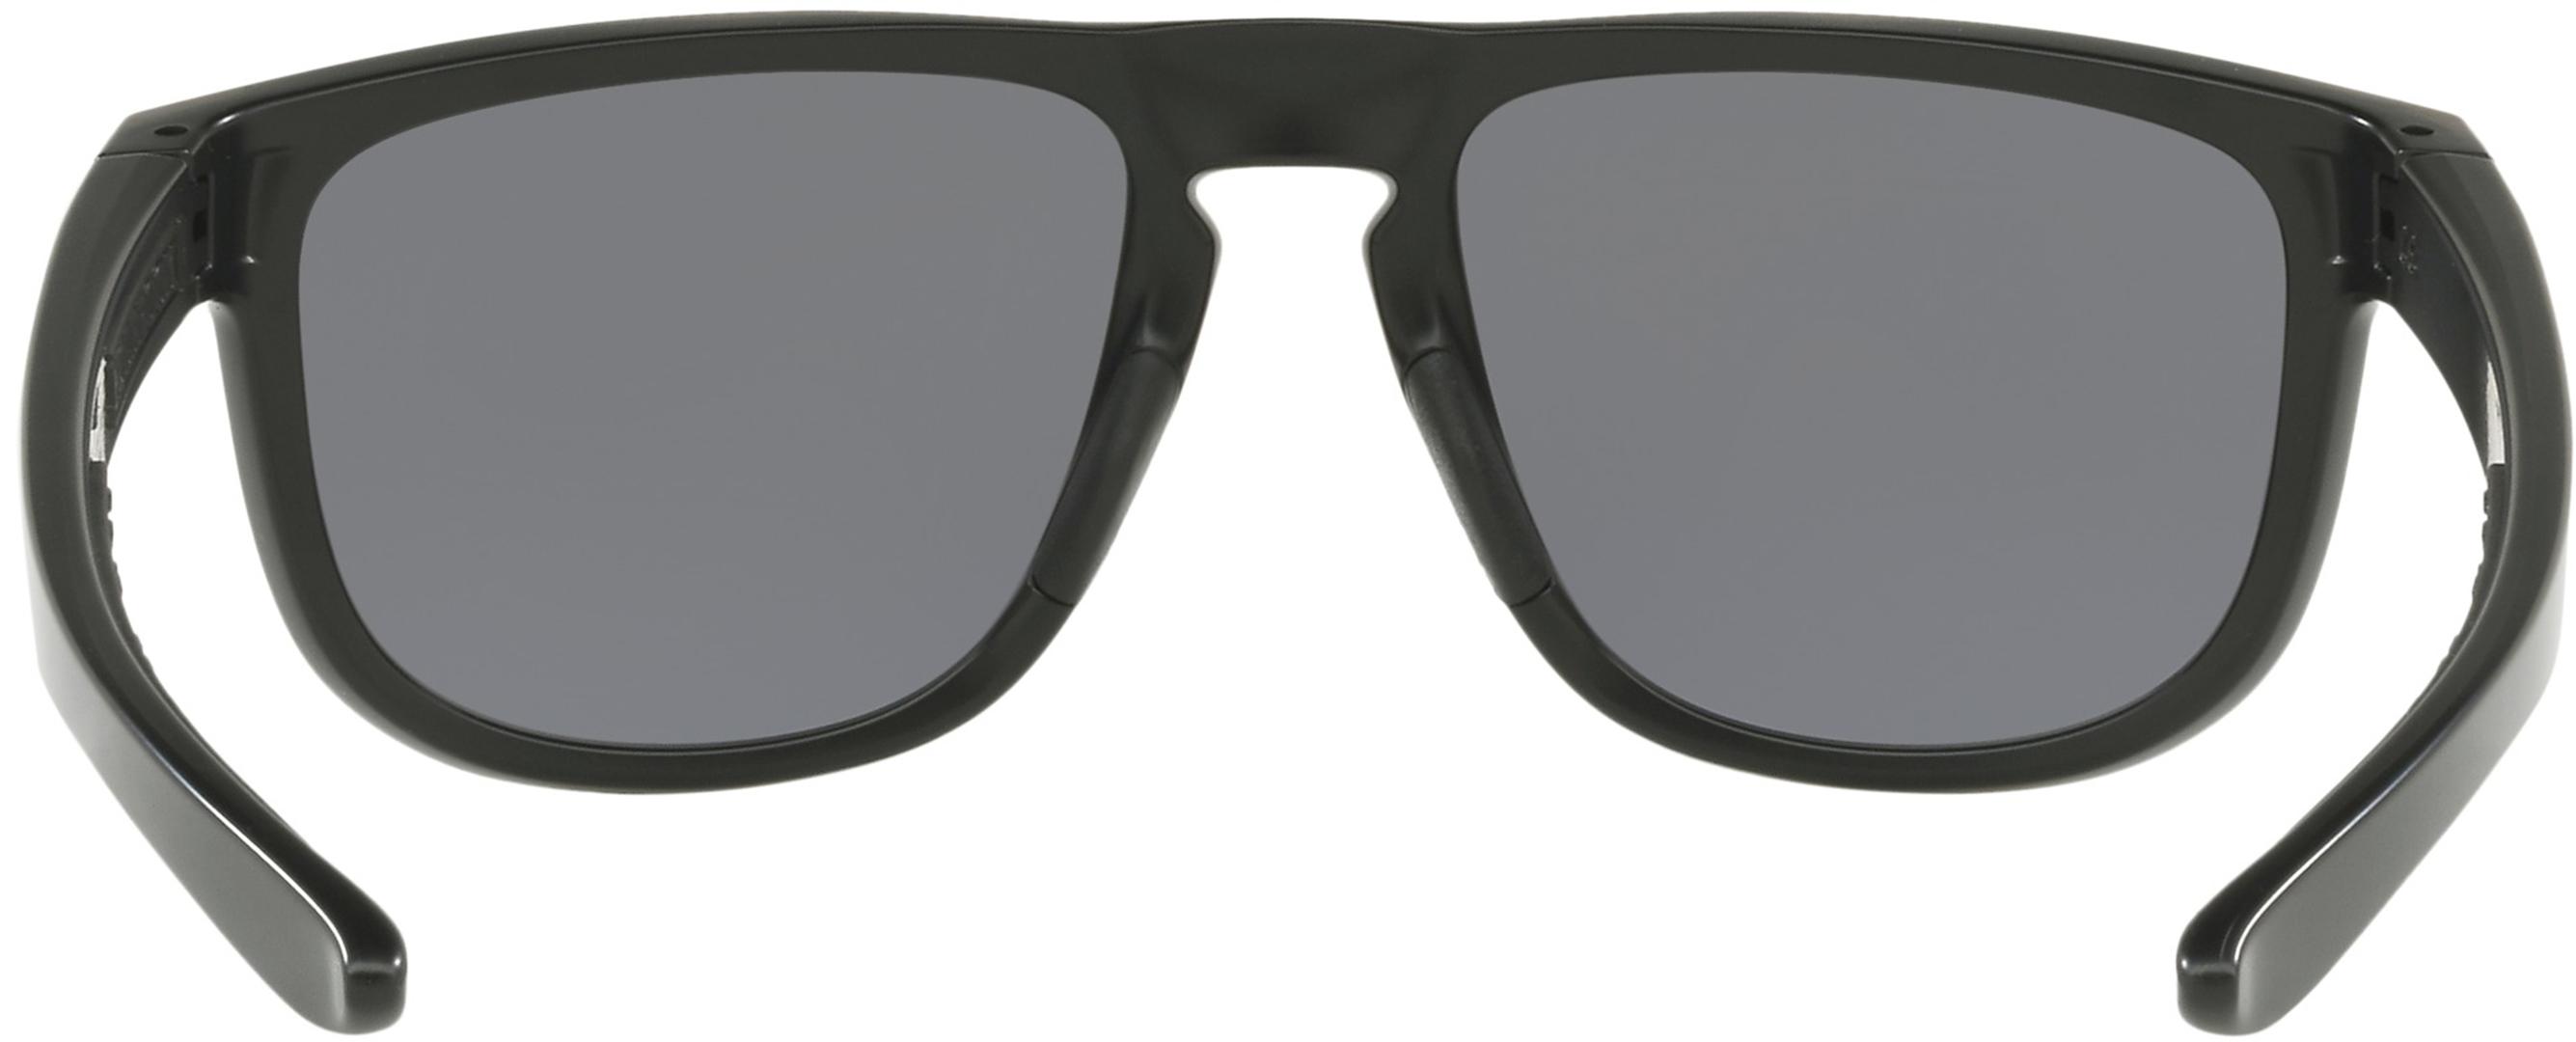 HOLBROOK R Sonnenbrille matte black/grey   Warehouse One